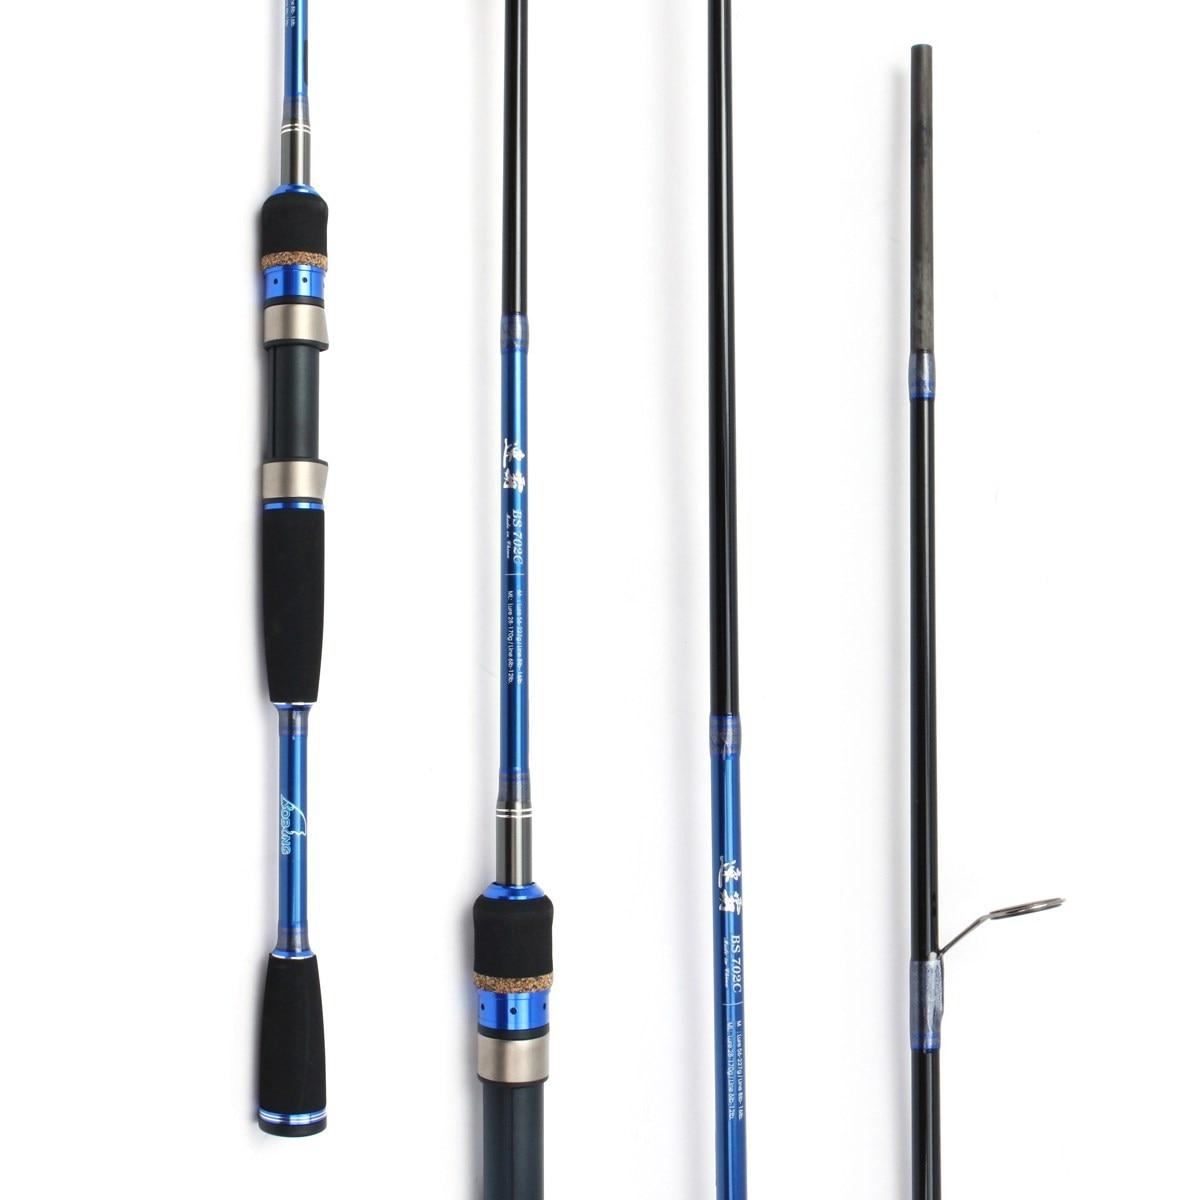 Bobing BG702 2.1m Lure Rod 2 Tips M ML Power Carbon Fiber Fishing Pole 28-227g Lure Weight Spinning Casting Rod Pole Bear 5KG